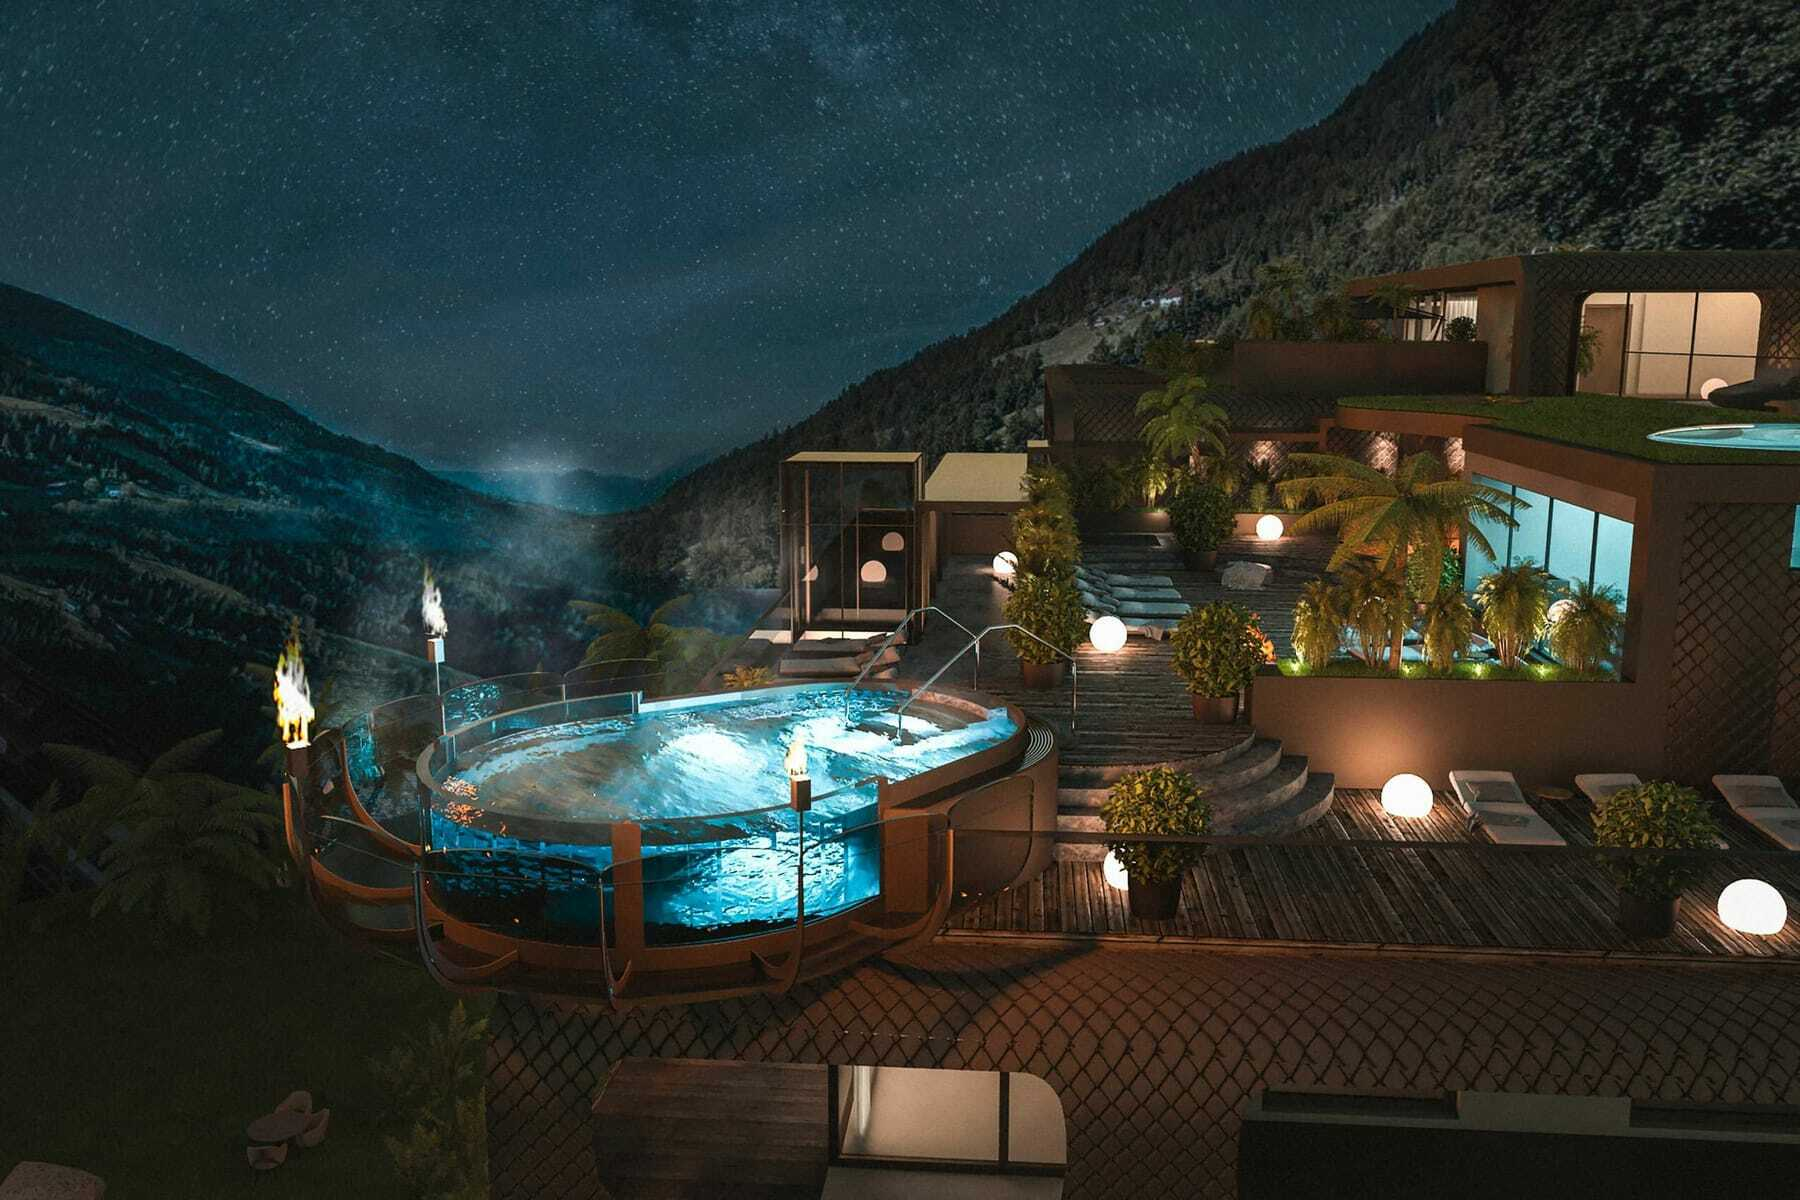 Pool bei Nacht_Quellenhof_Paseier